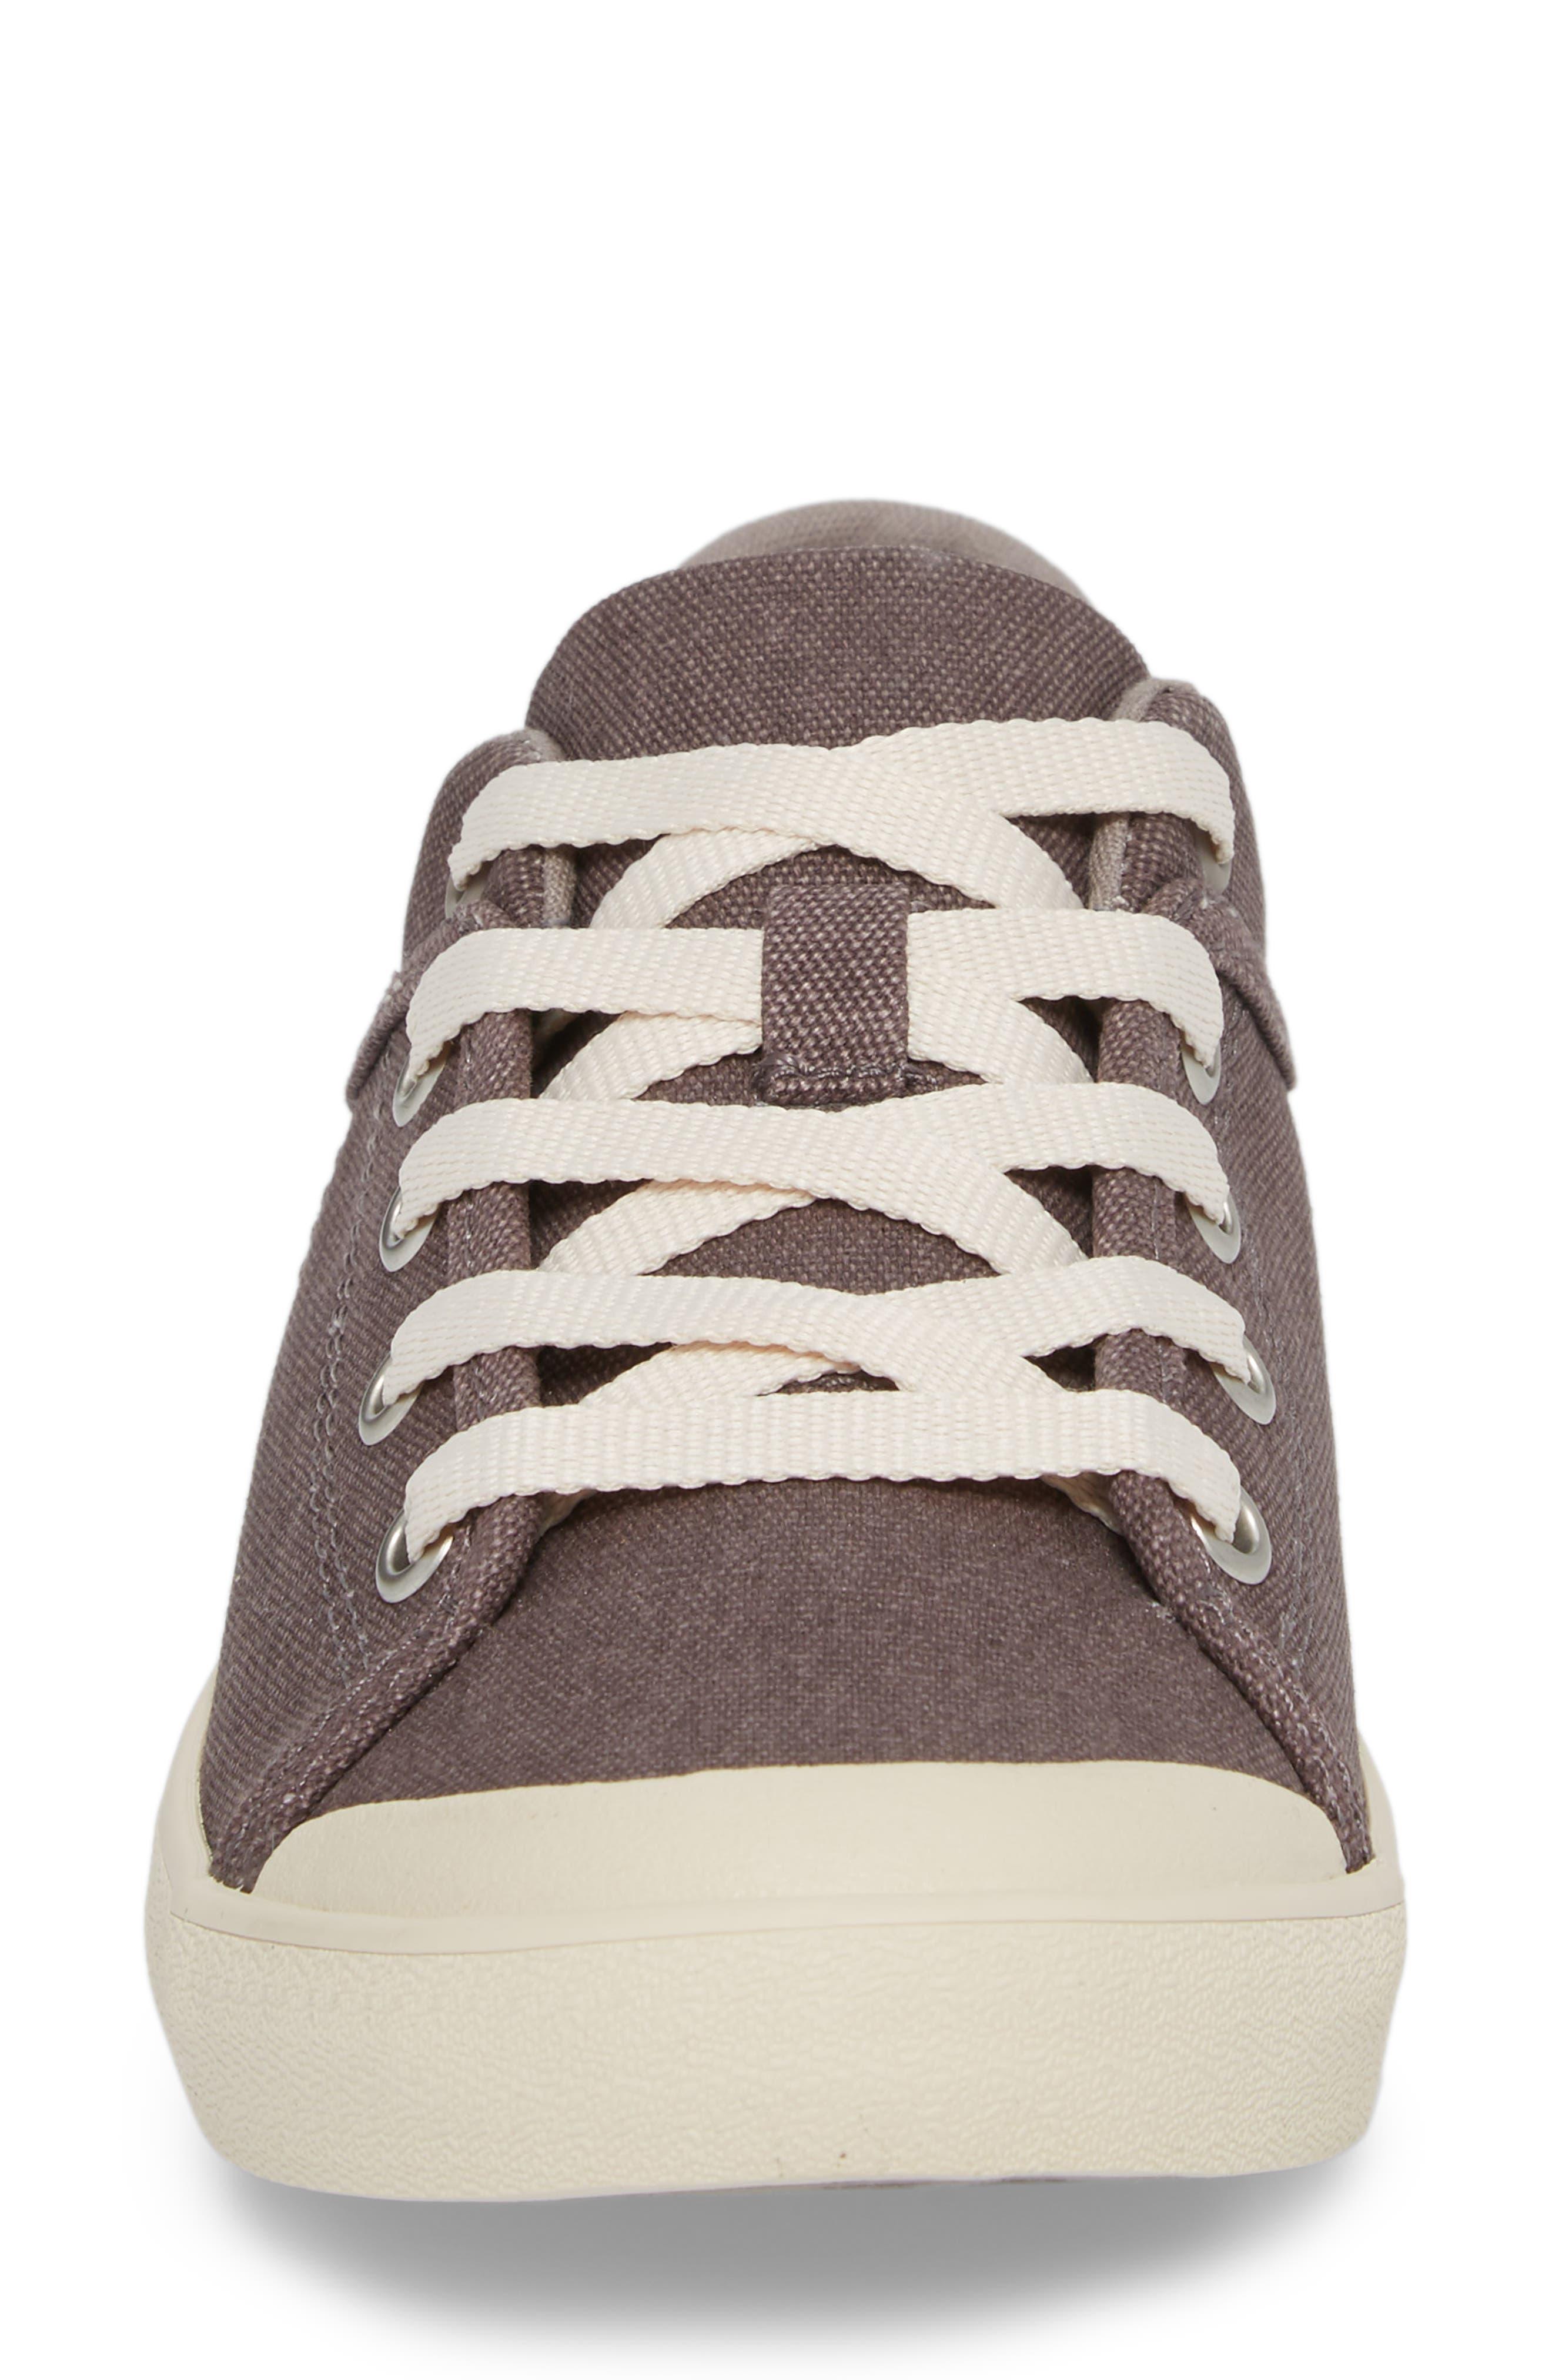 'Freewheel' Sneaker,                             Alternate thumbnail 4, color,                             Plum Truffle